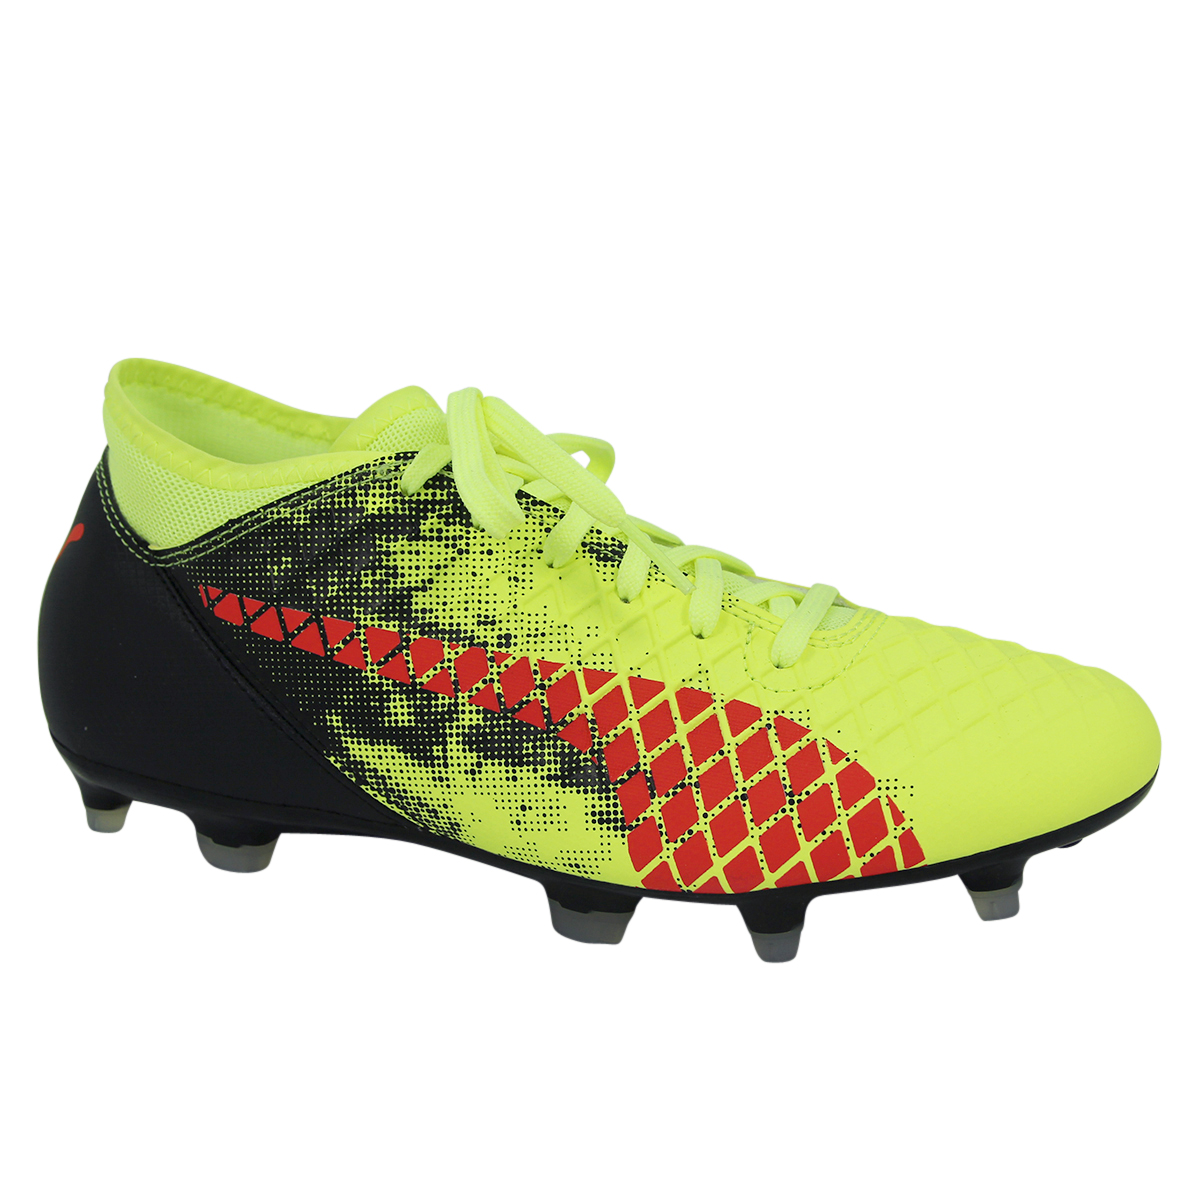 Chaussures de football FUTURE FUTURE FUTURE 18 4 HYFG b31a46